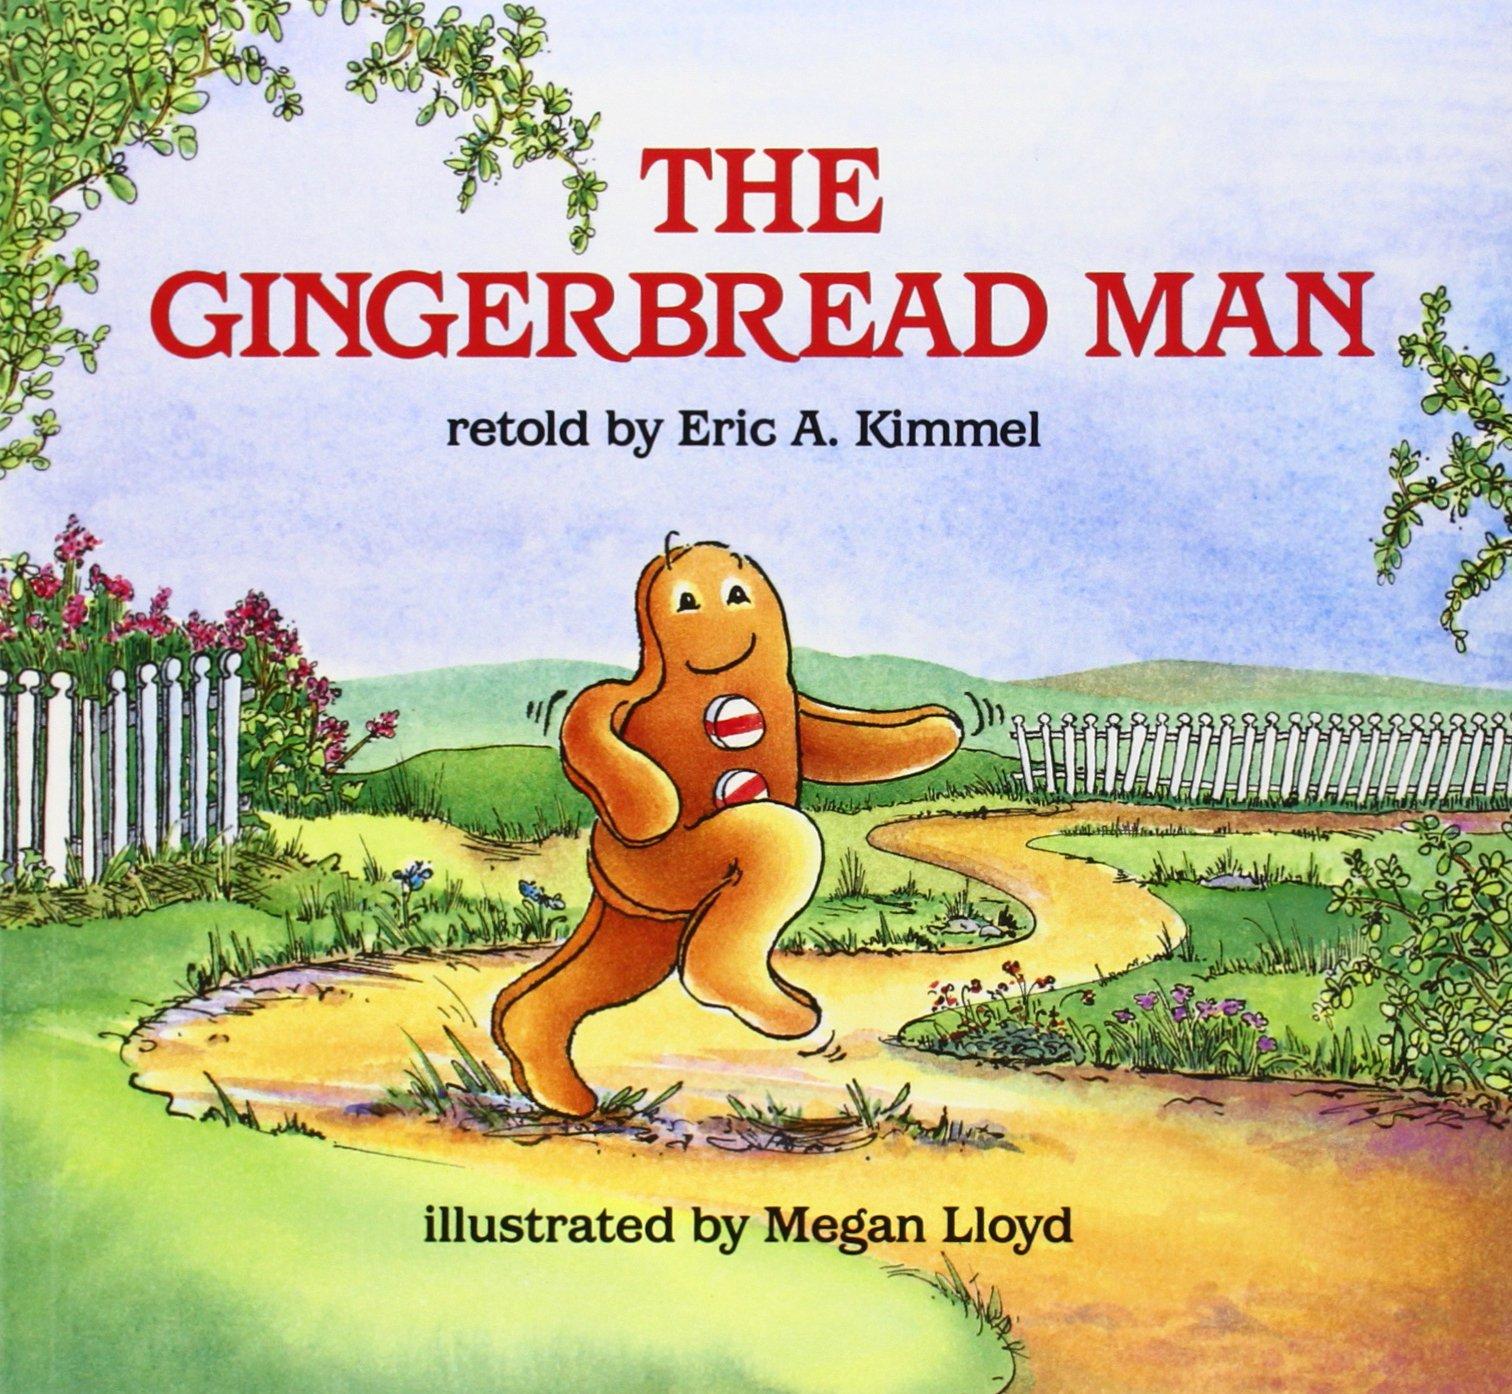 Gingerbread Man Books For Kids 15